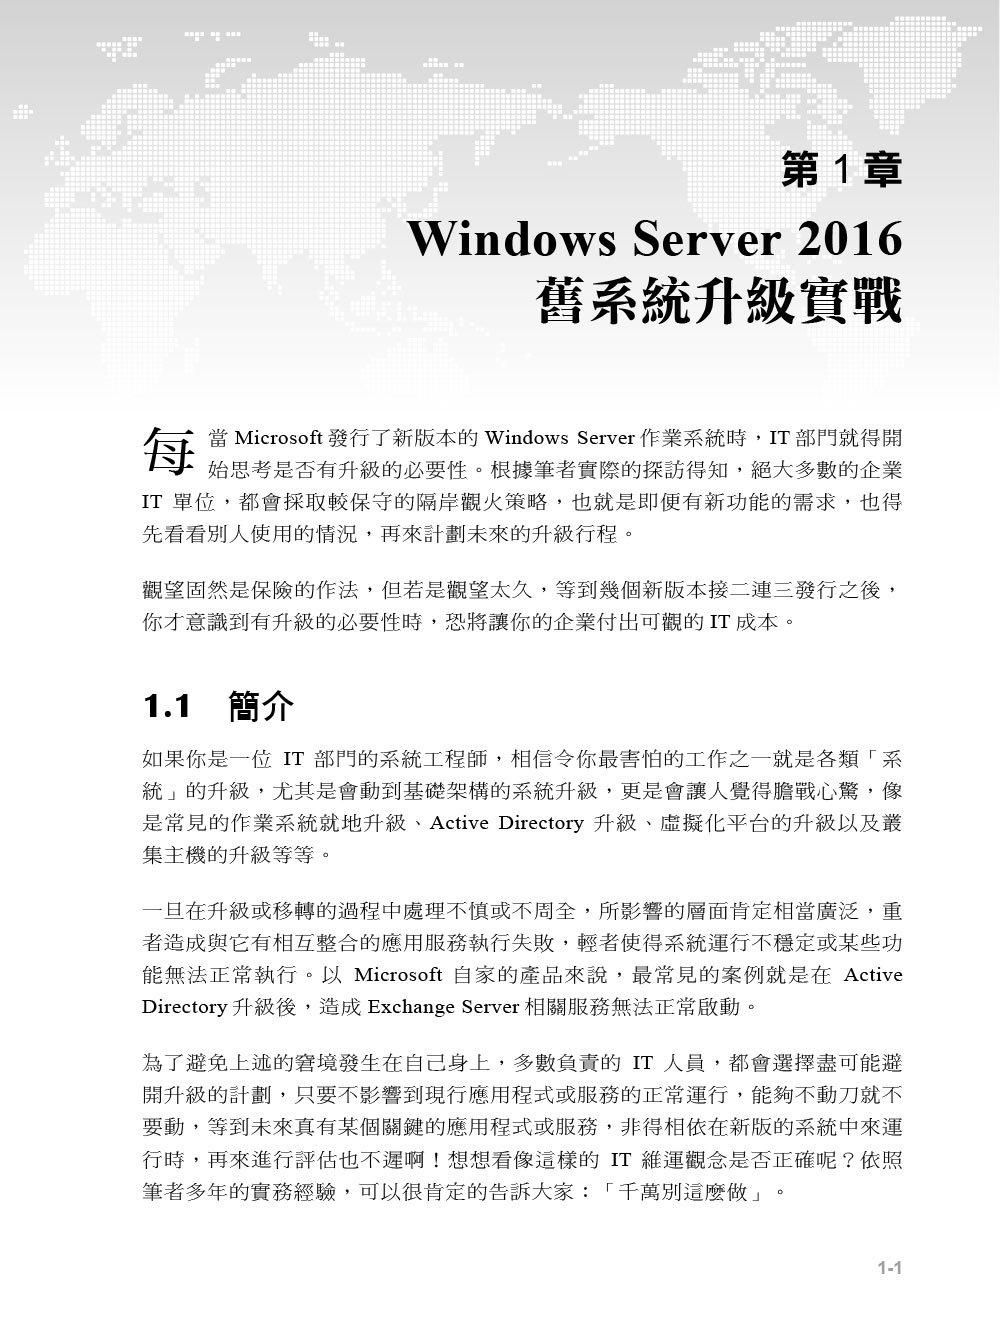 Windows Server 2016 實戰寶典|系統升級x容器技術x虛擬化x異質平台整合-preview-1